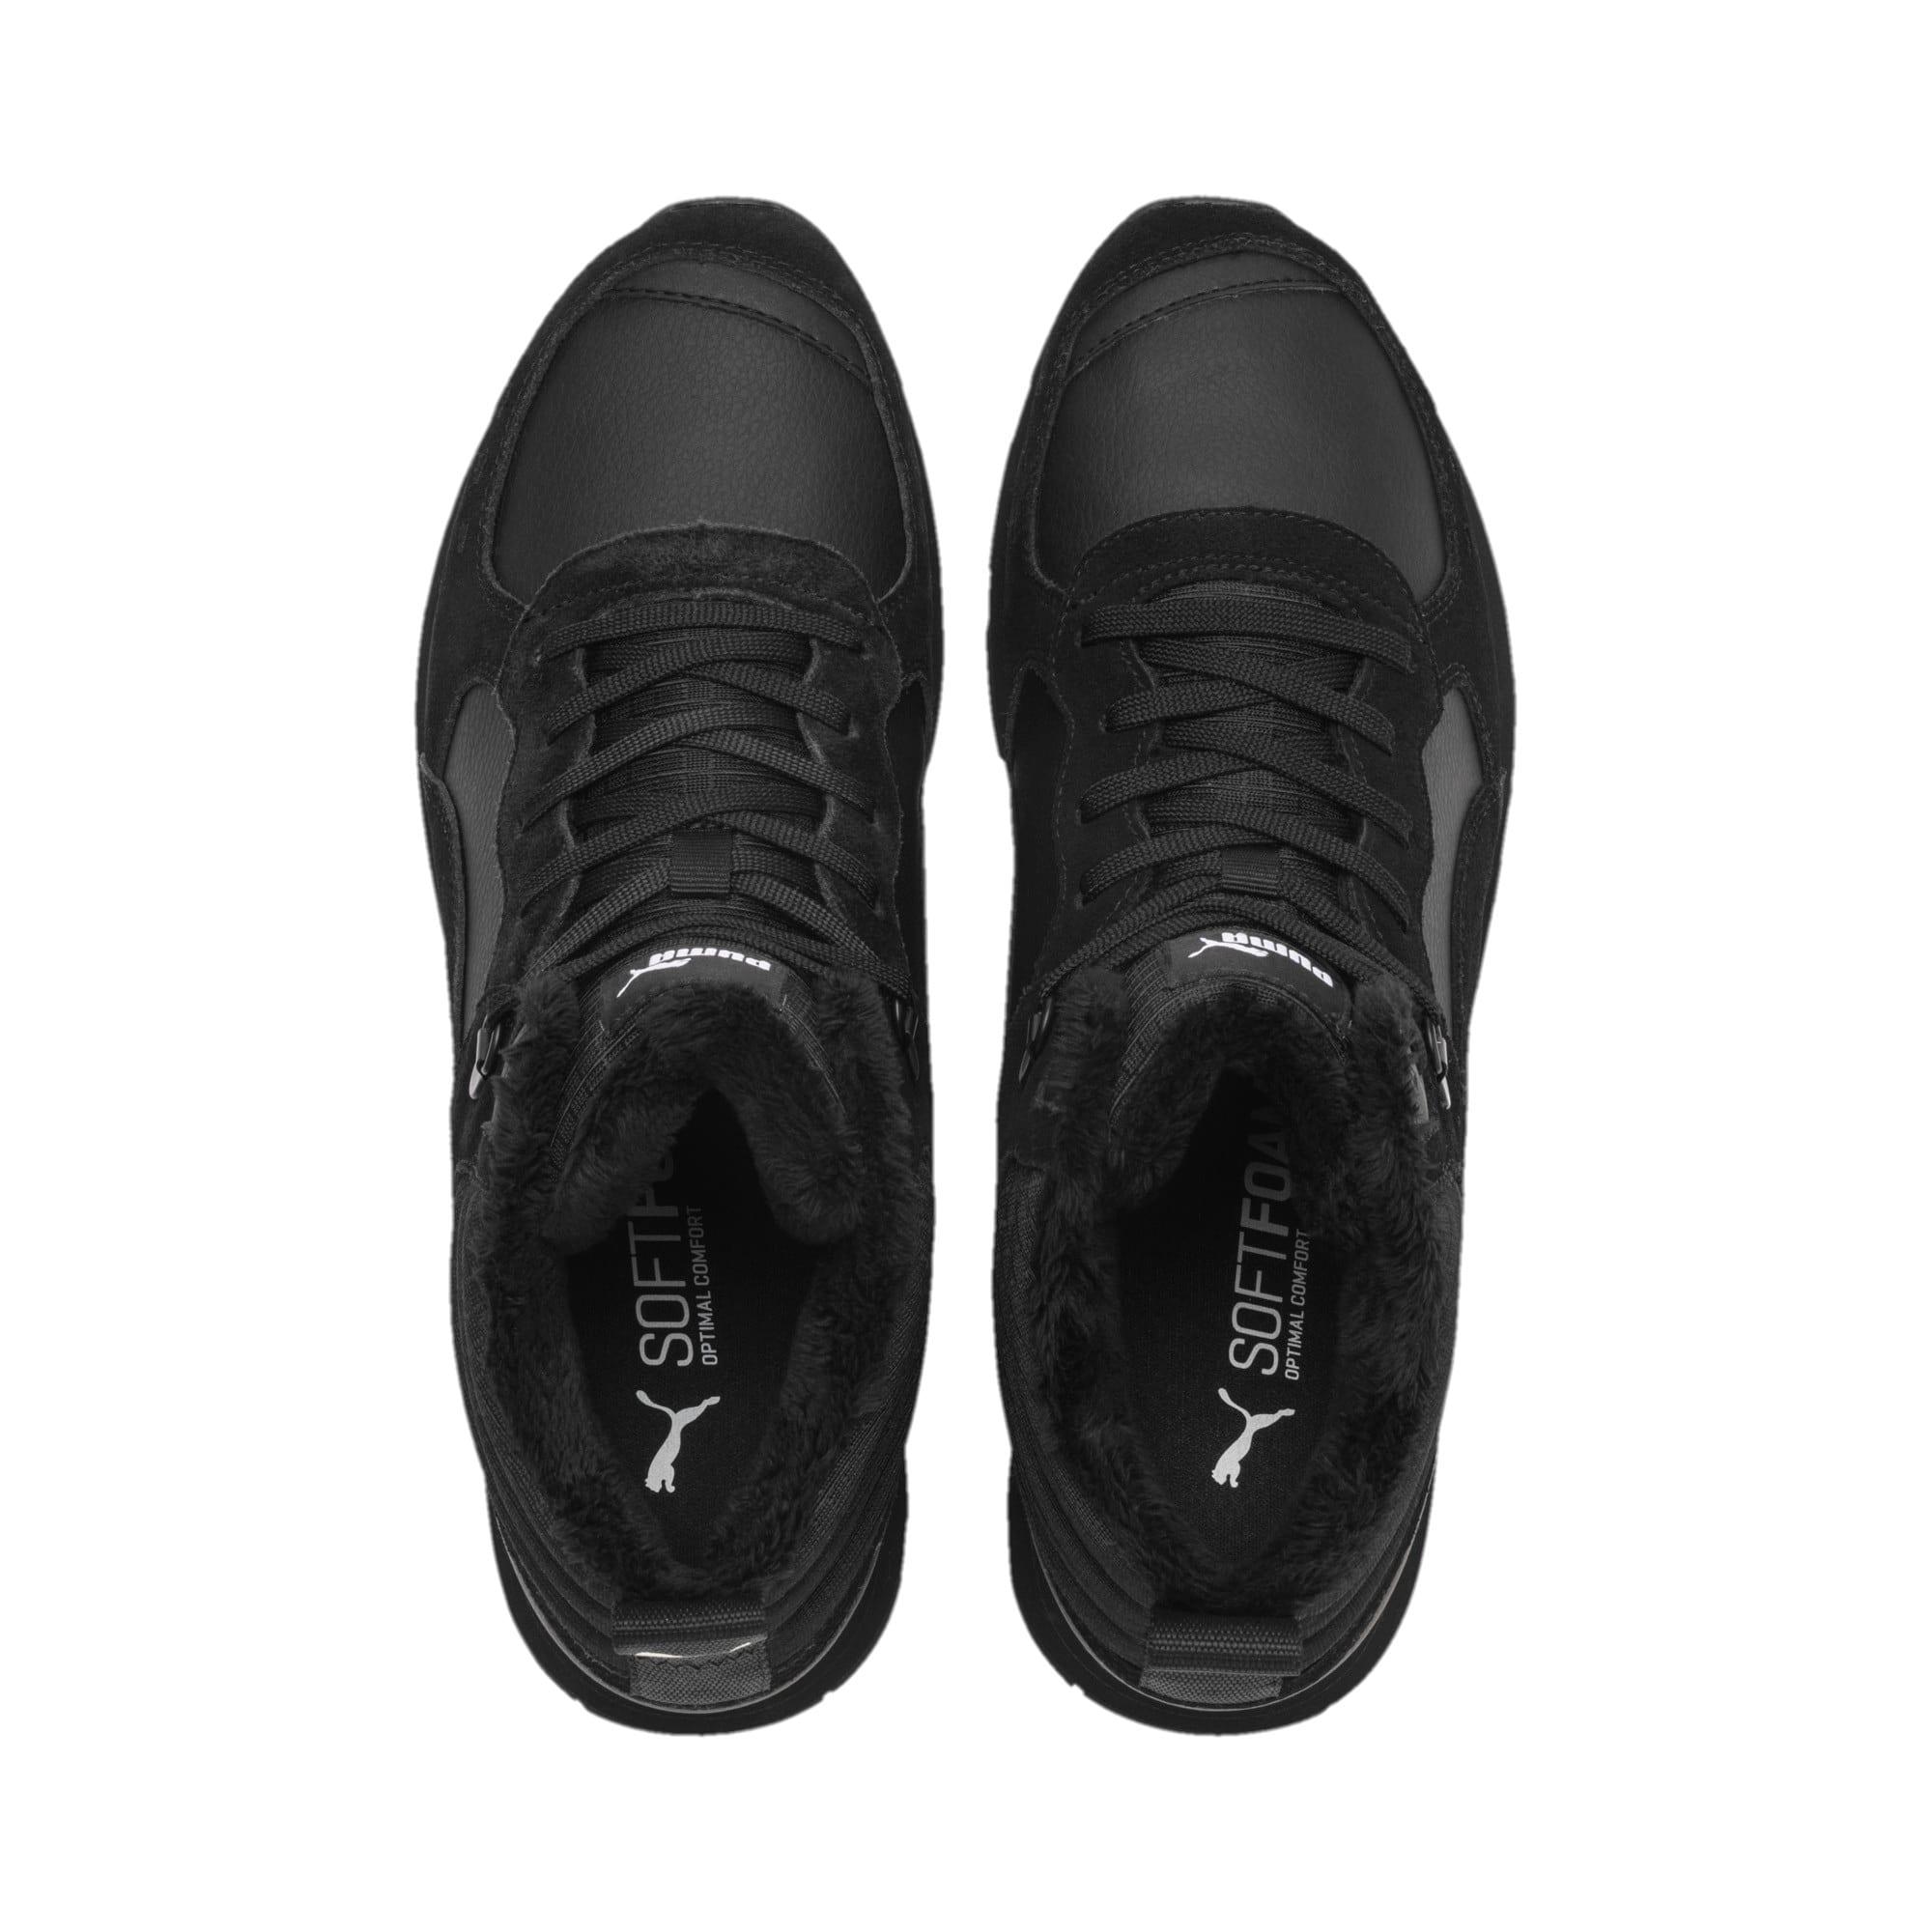 Anteprima 7 di Vista Mid-Cut Winter Running Shoes, Puma Black-Puma White, medio